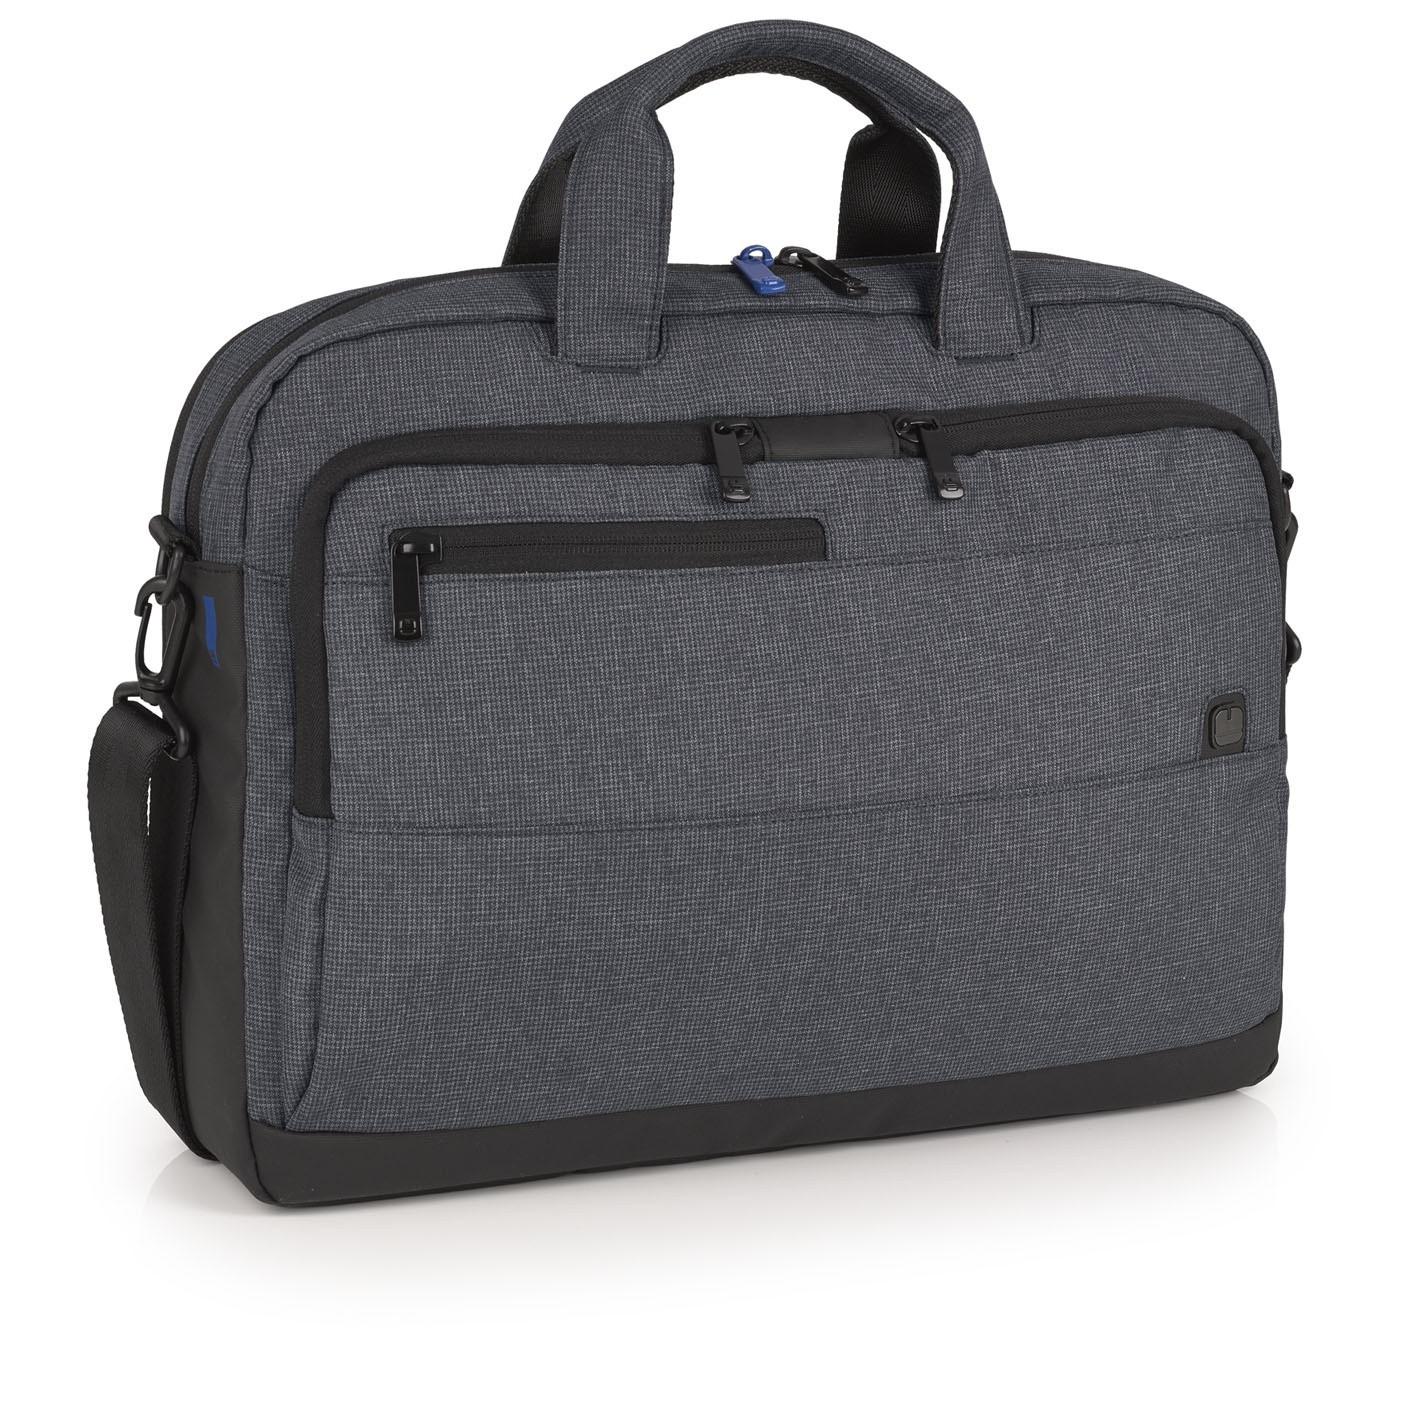 Gabol Expert Businessbag 15.6 inch 410220 Grey